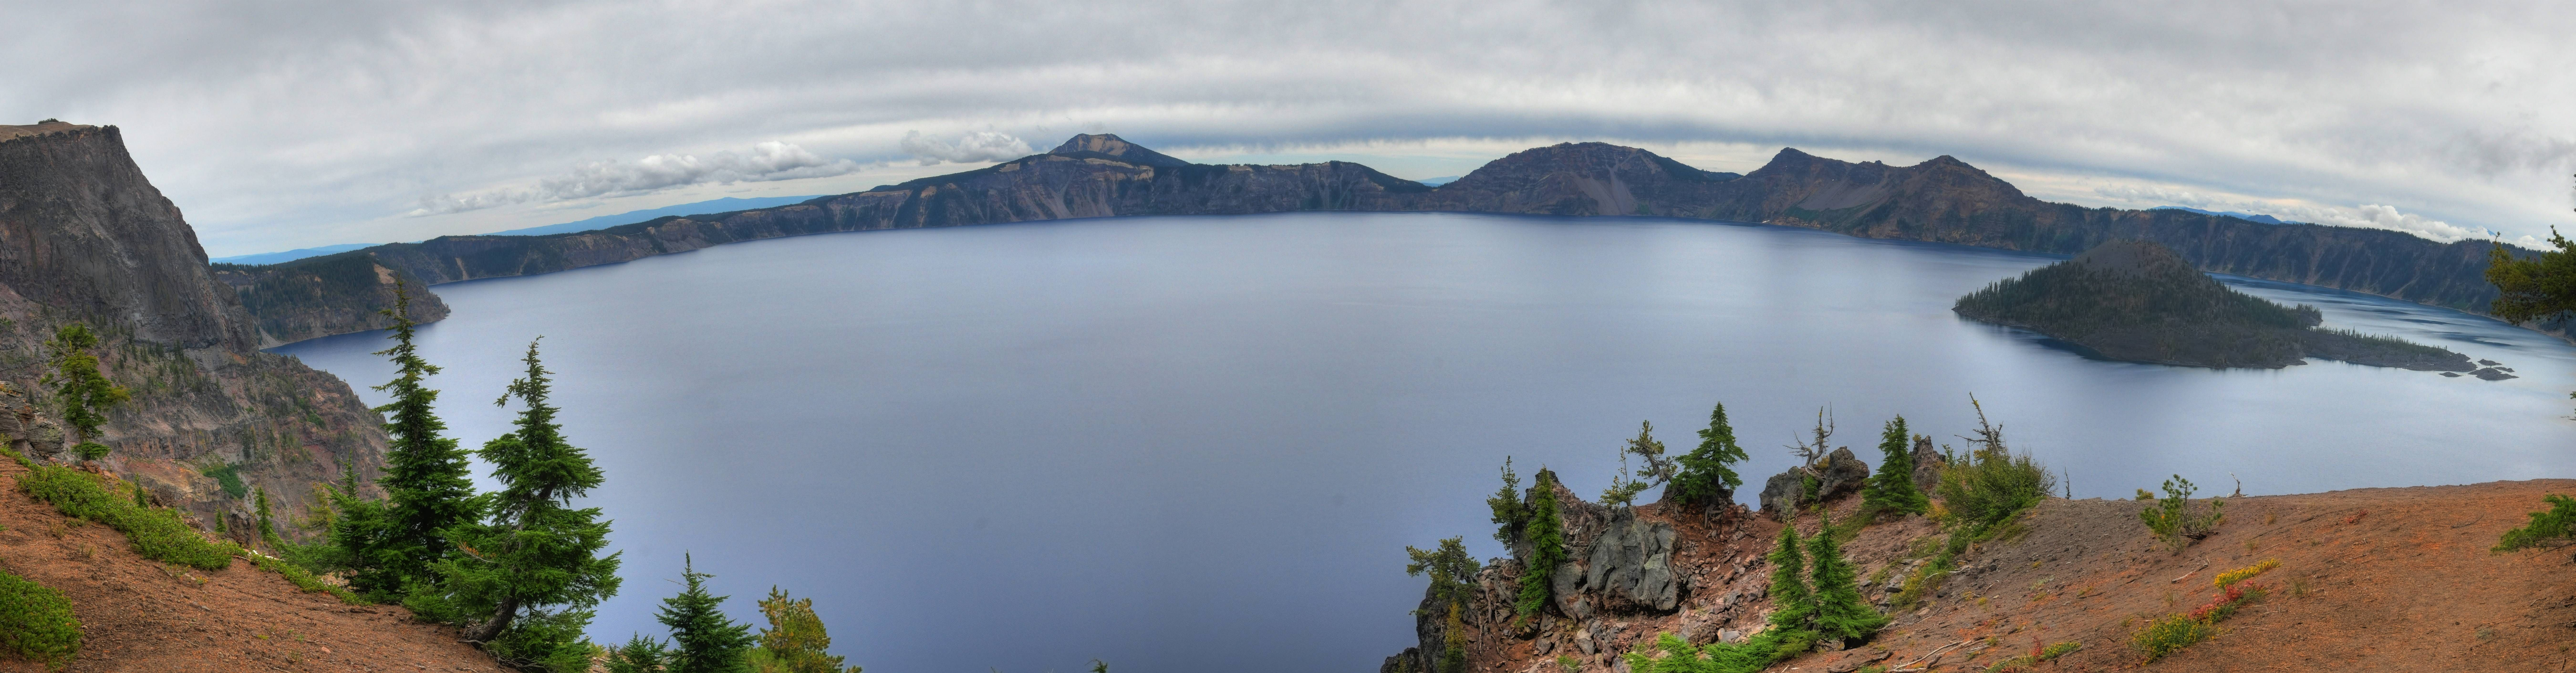 Crater Lake Oregon [OC] [108002820] #craterlakeoregon Crater Lake Oregon [OC] [108002820] #craterlakeoregon Crater Lake Oregon [OC] [108002820] #craterlakeoregon Crater Lake Oregon [OC] [108002820] #craterlakeoregon